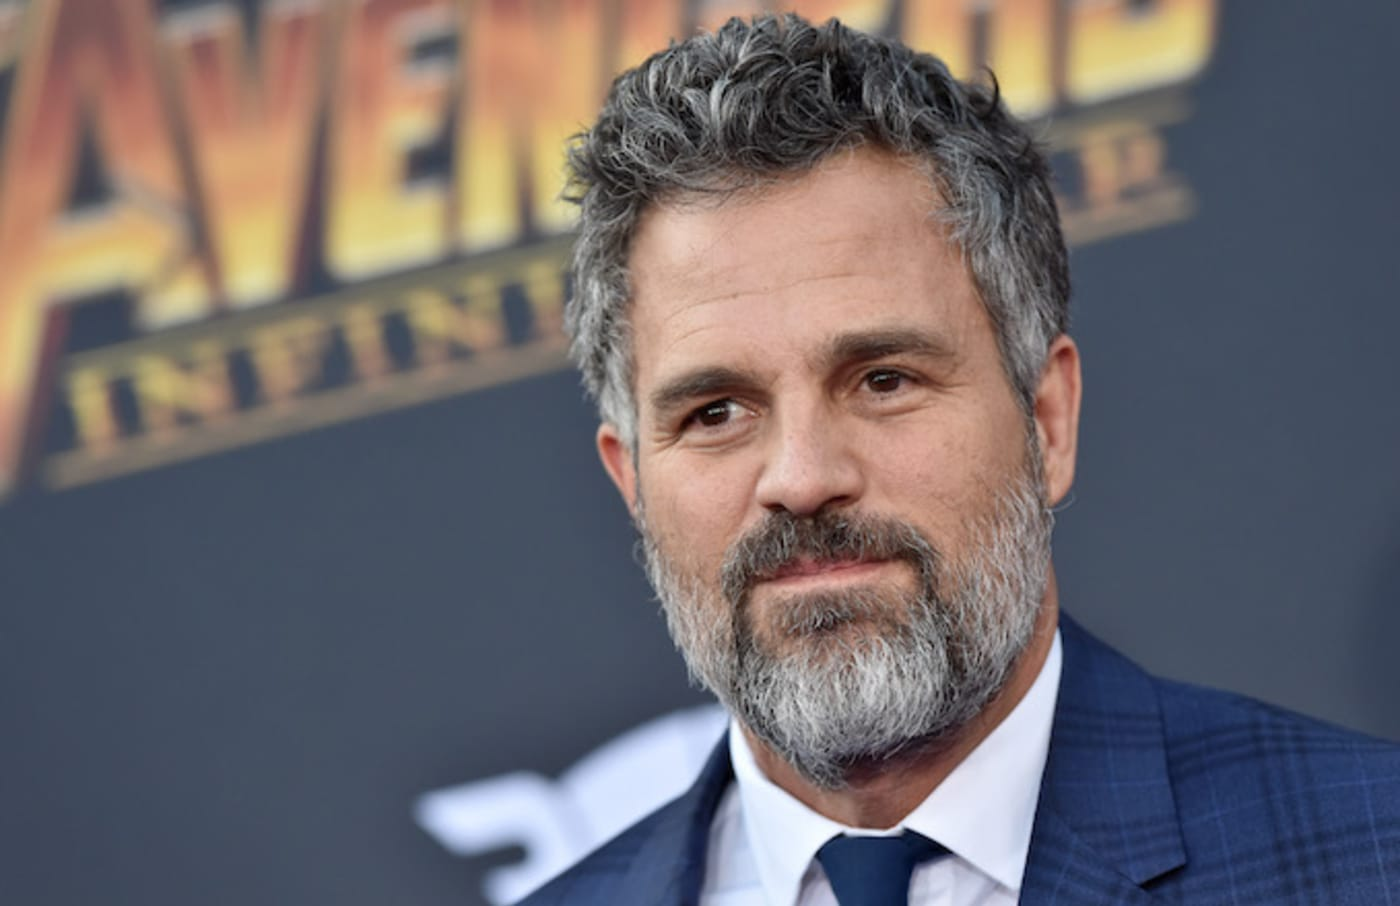 Mark Ruffalo attends the premiere of 'Avengers: Infinity War.'